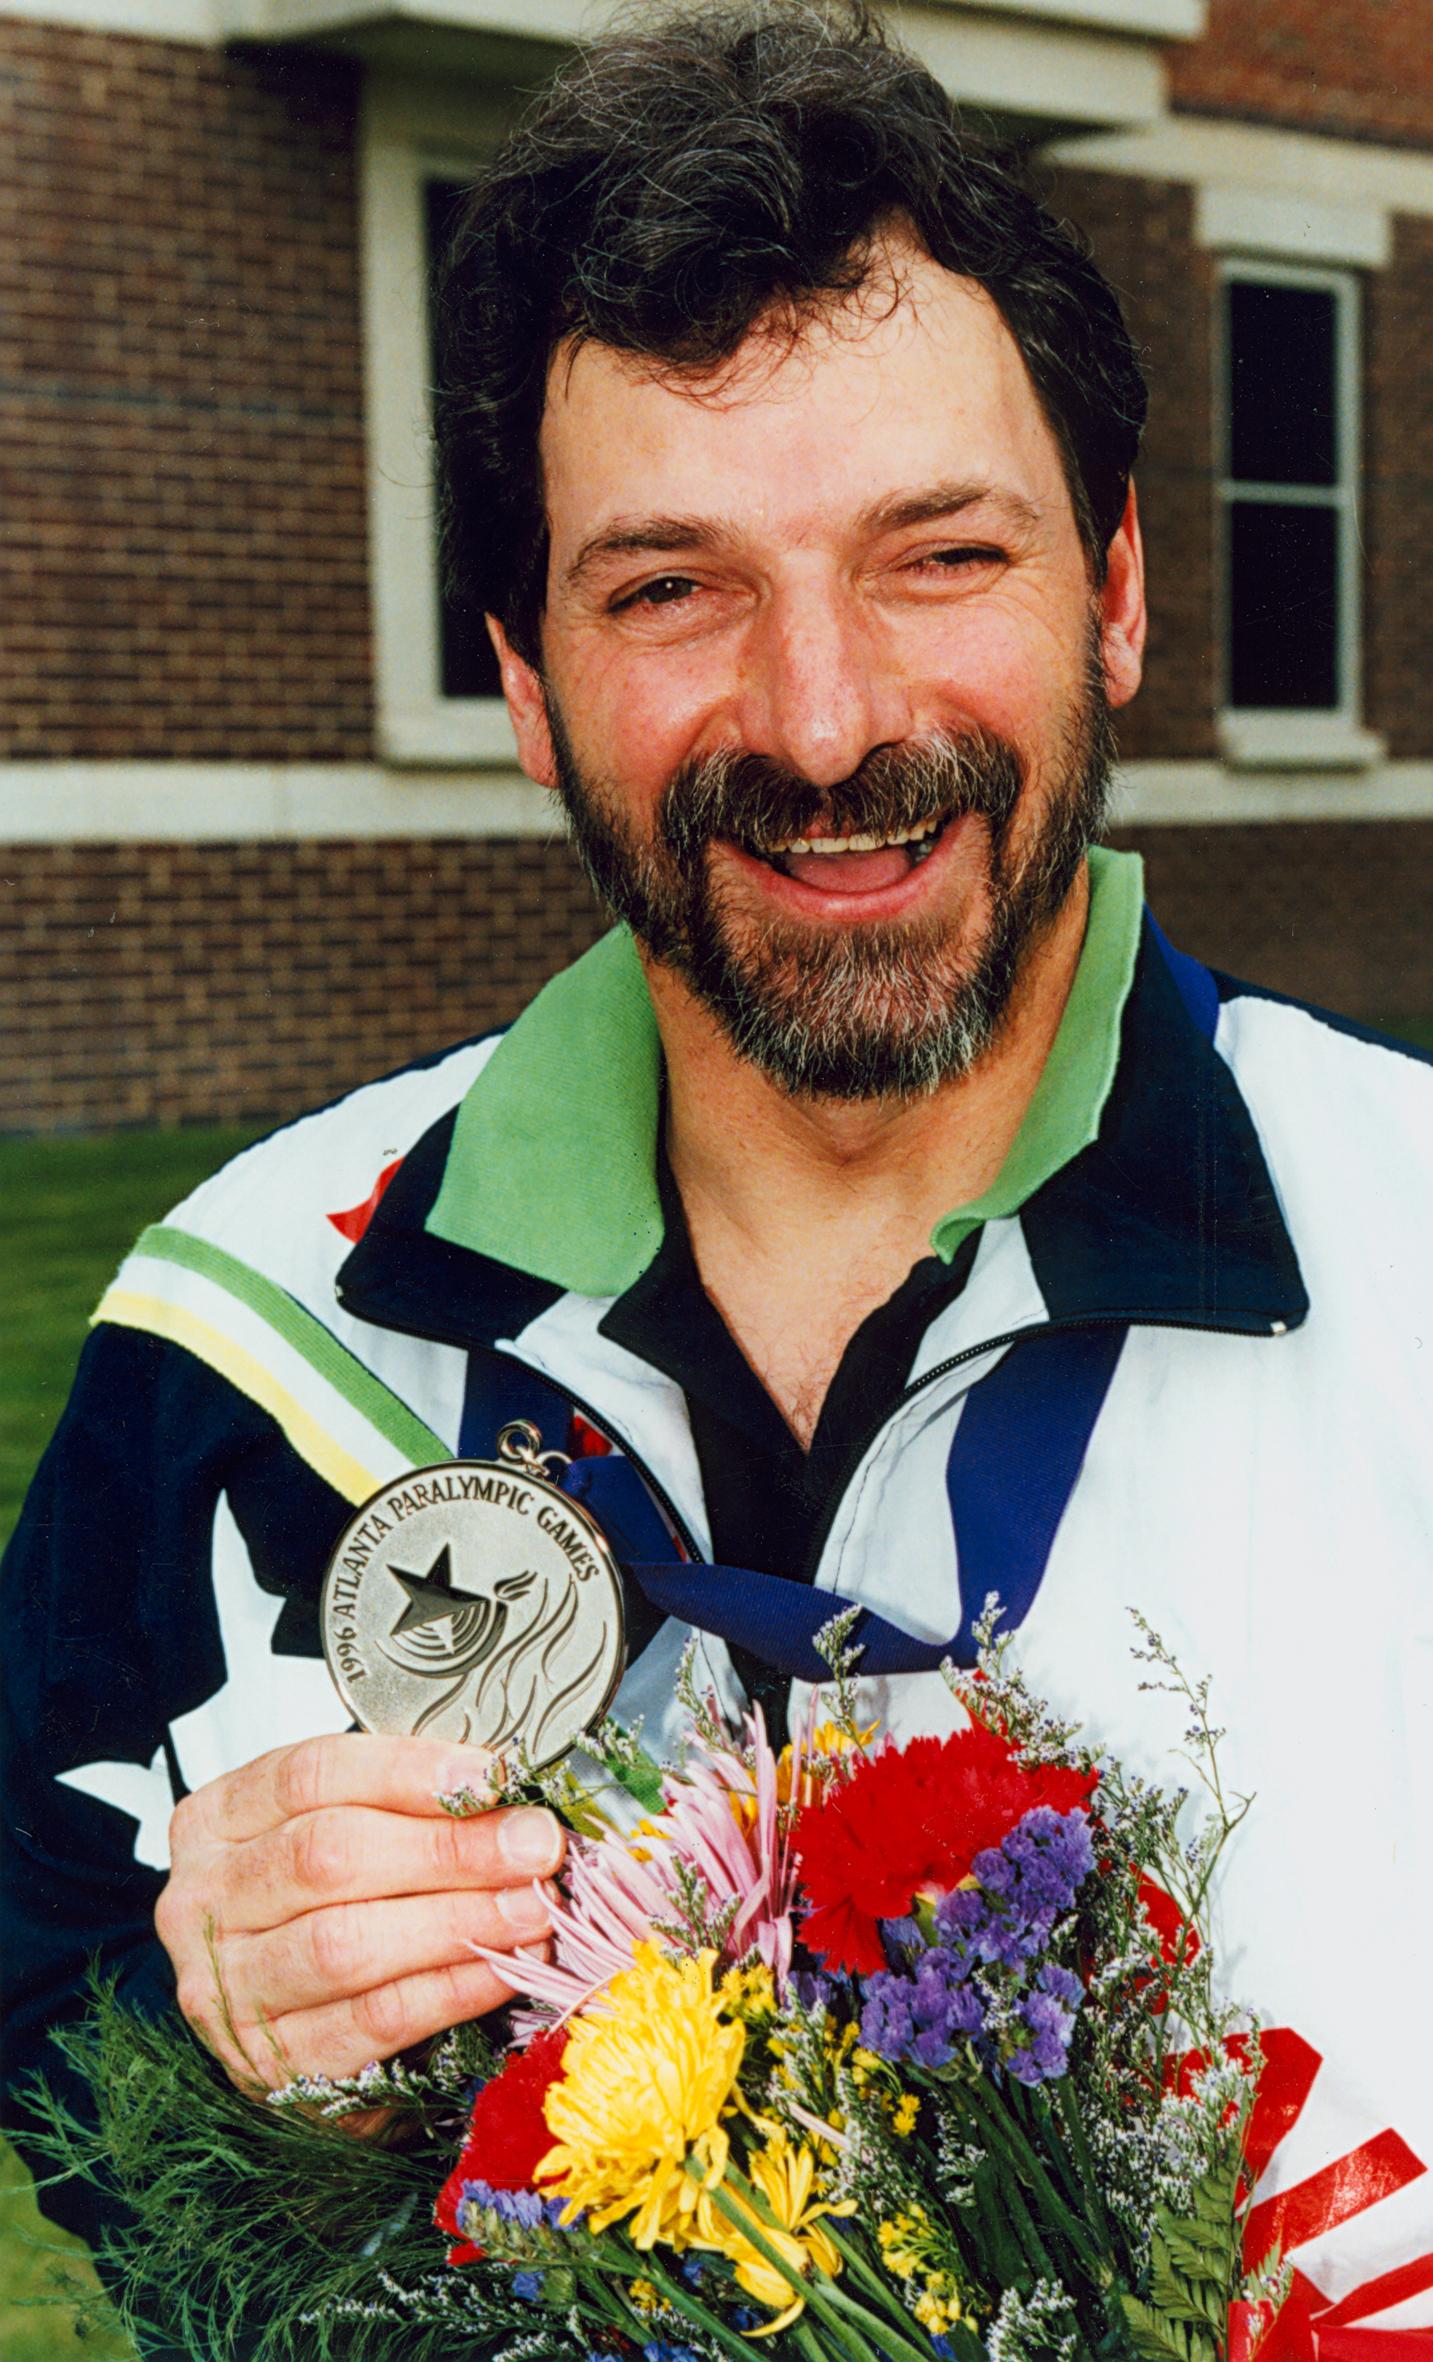 Image of James Nomarhas from Wikidata